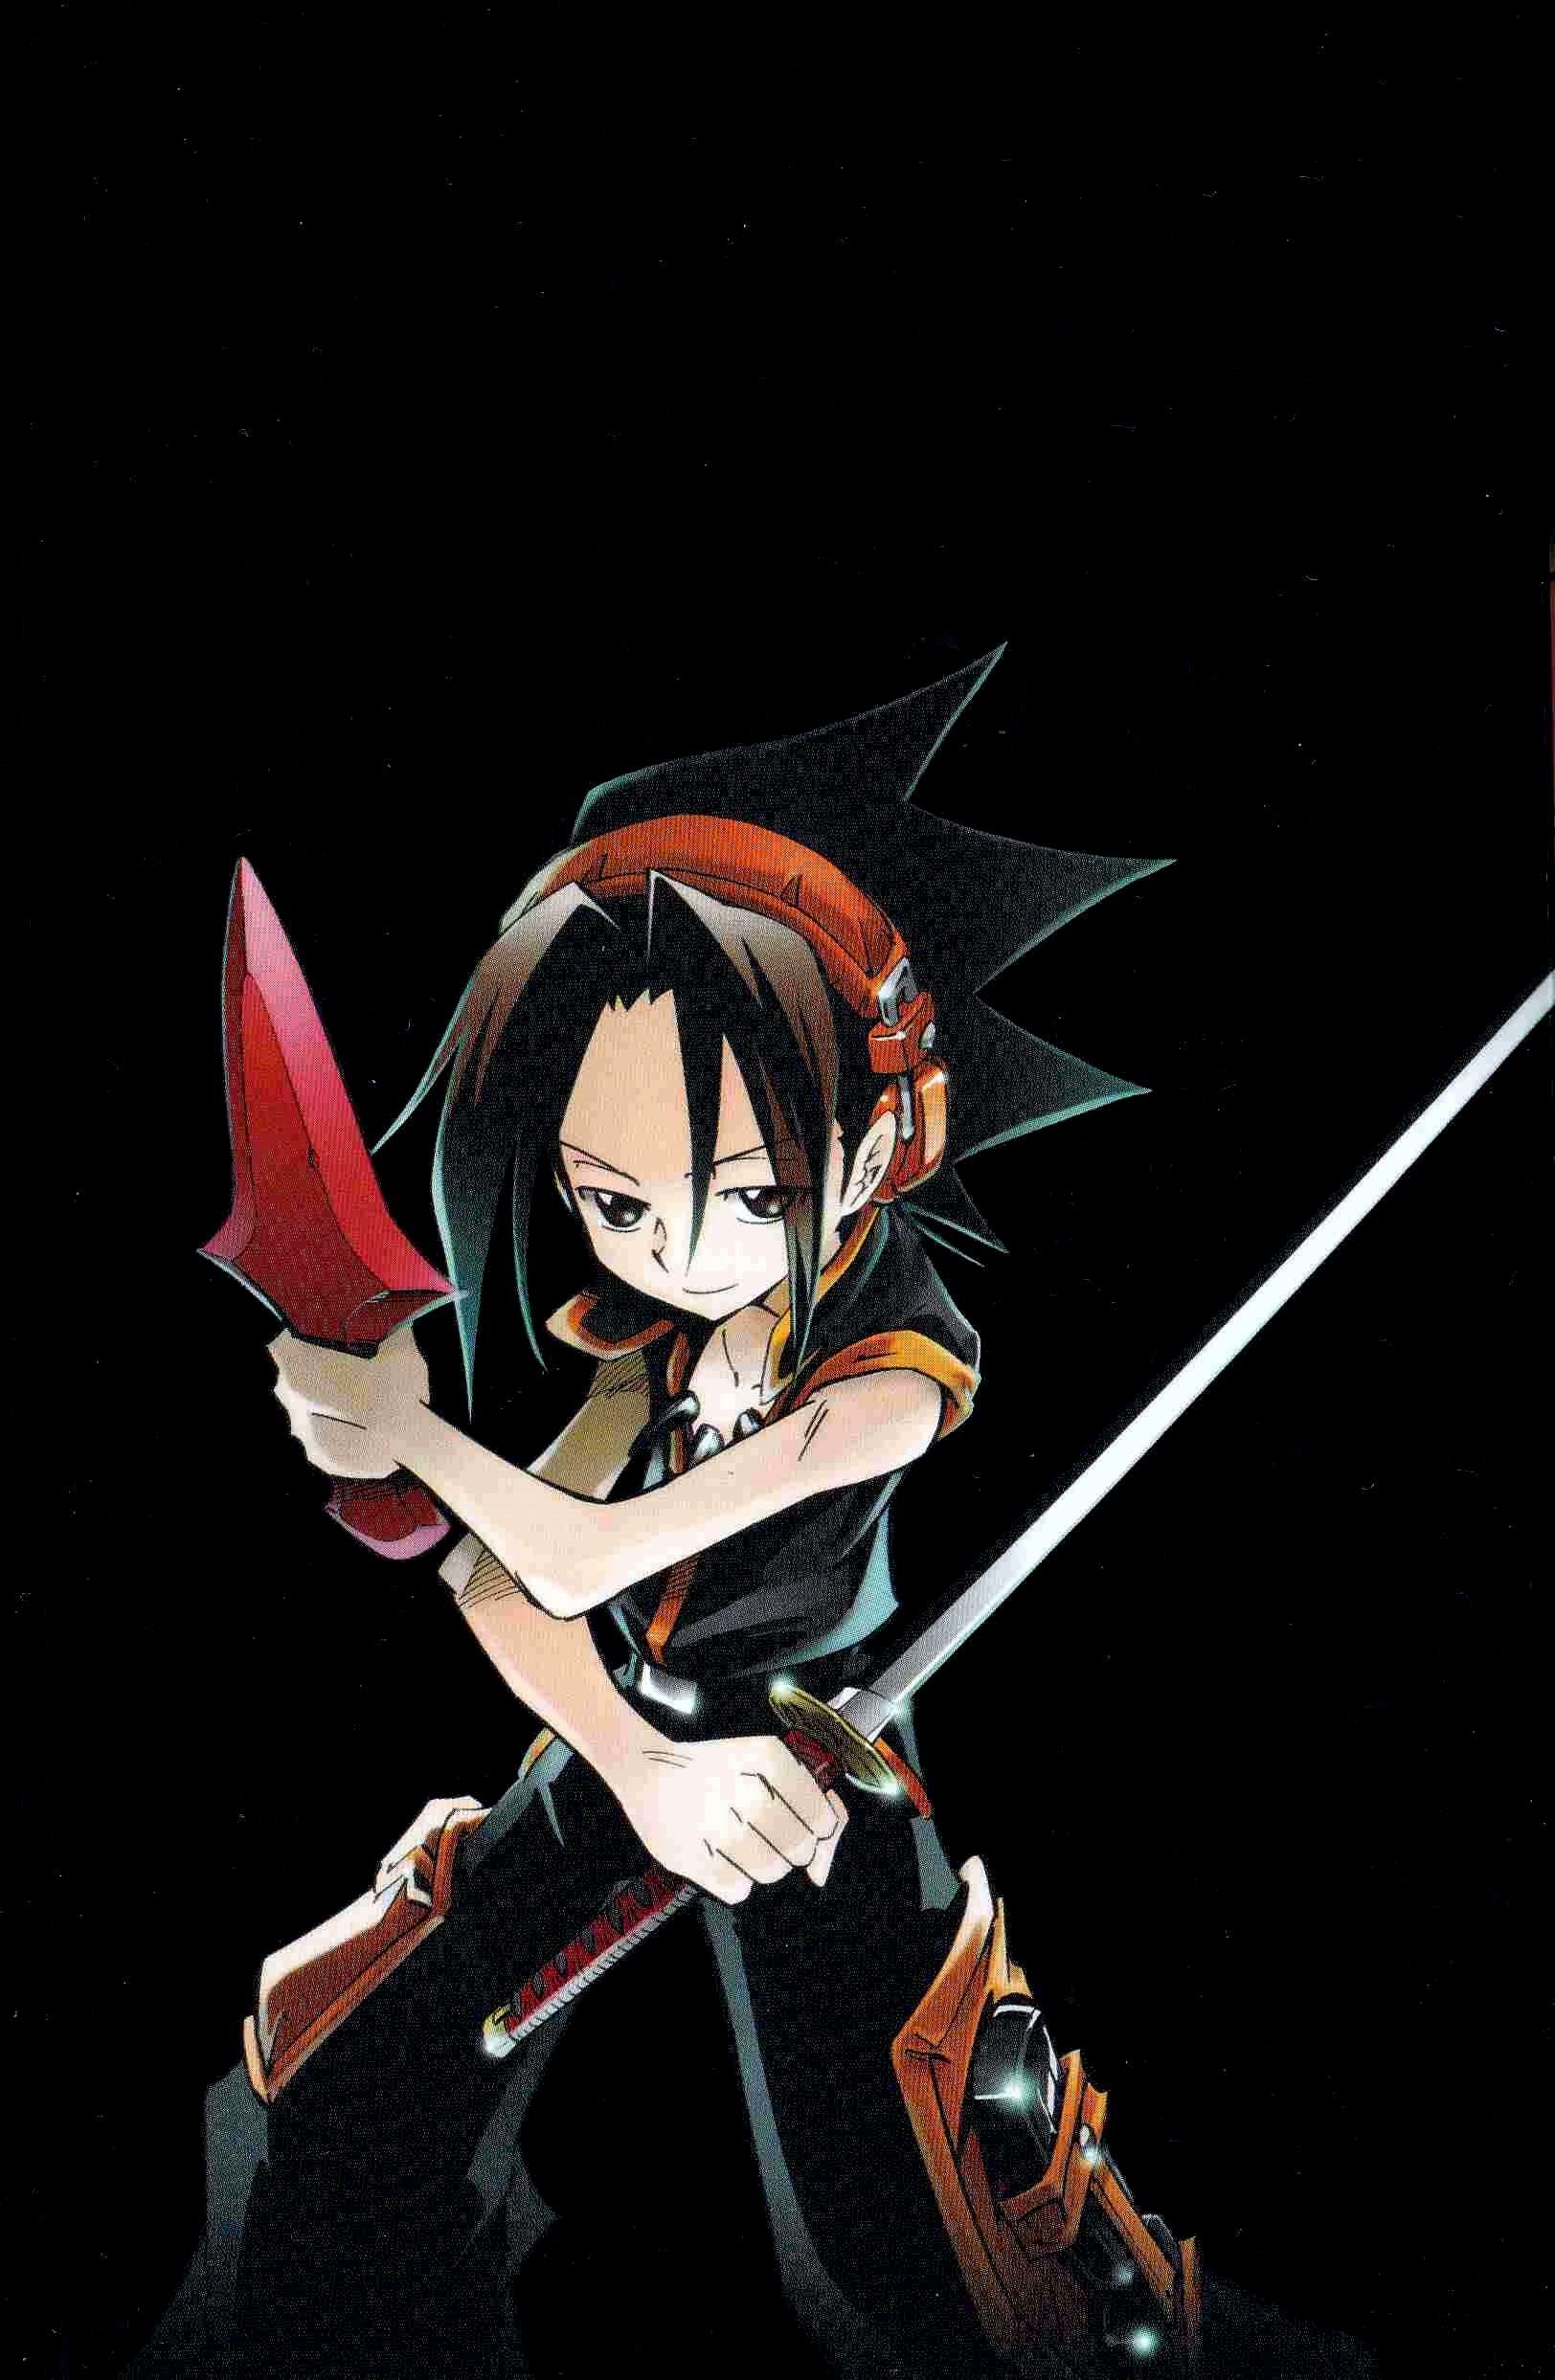 Shaman King Hq Manga Poster Anime Manga Serien